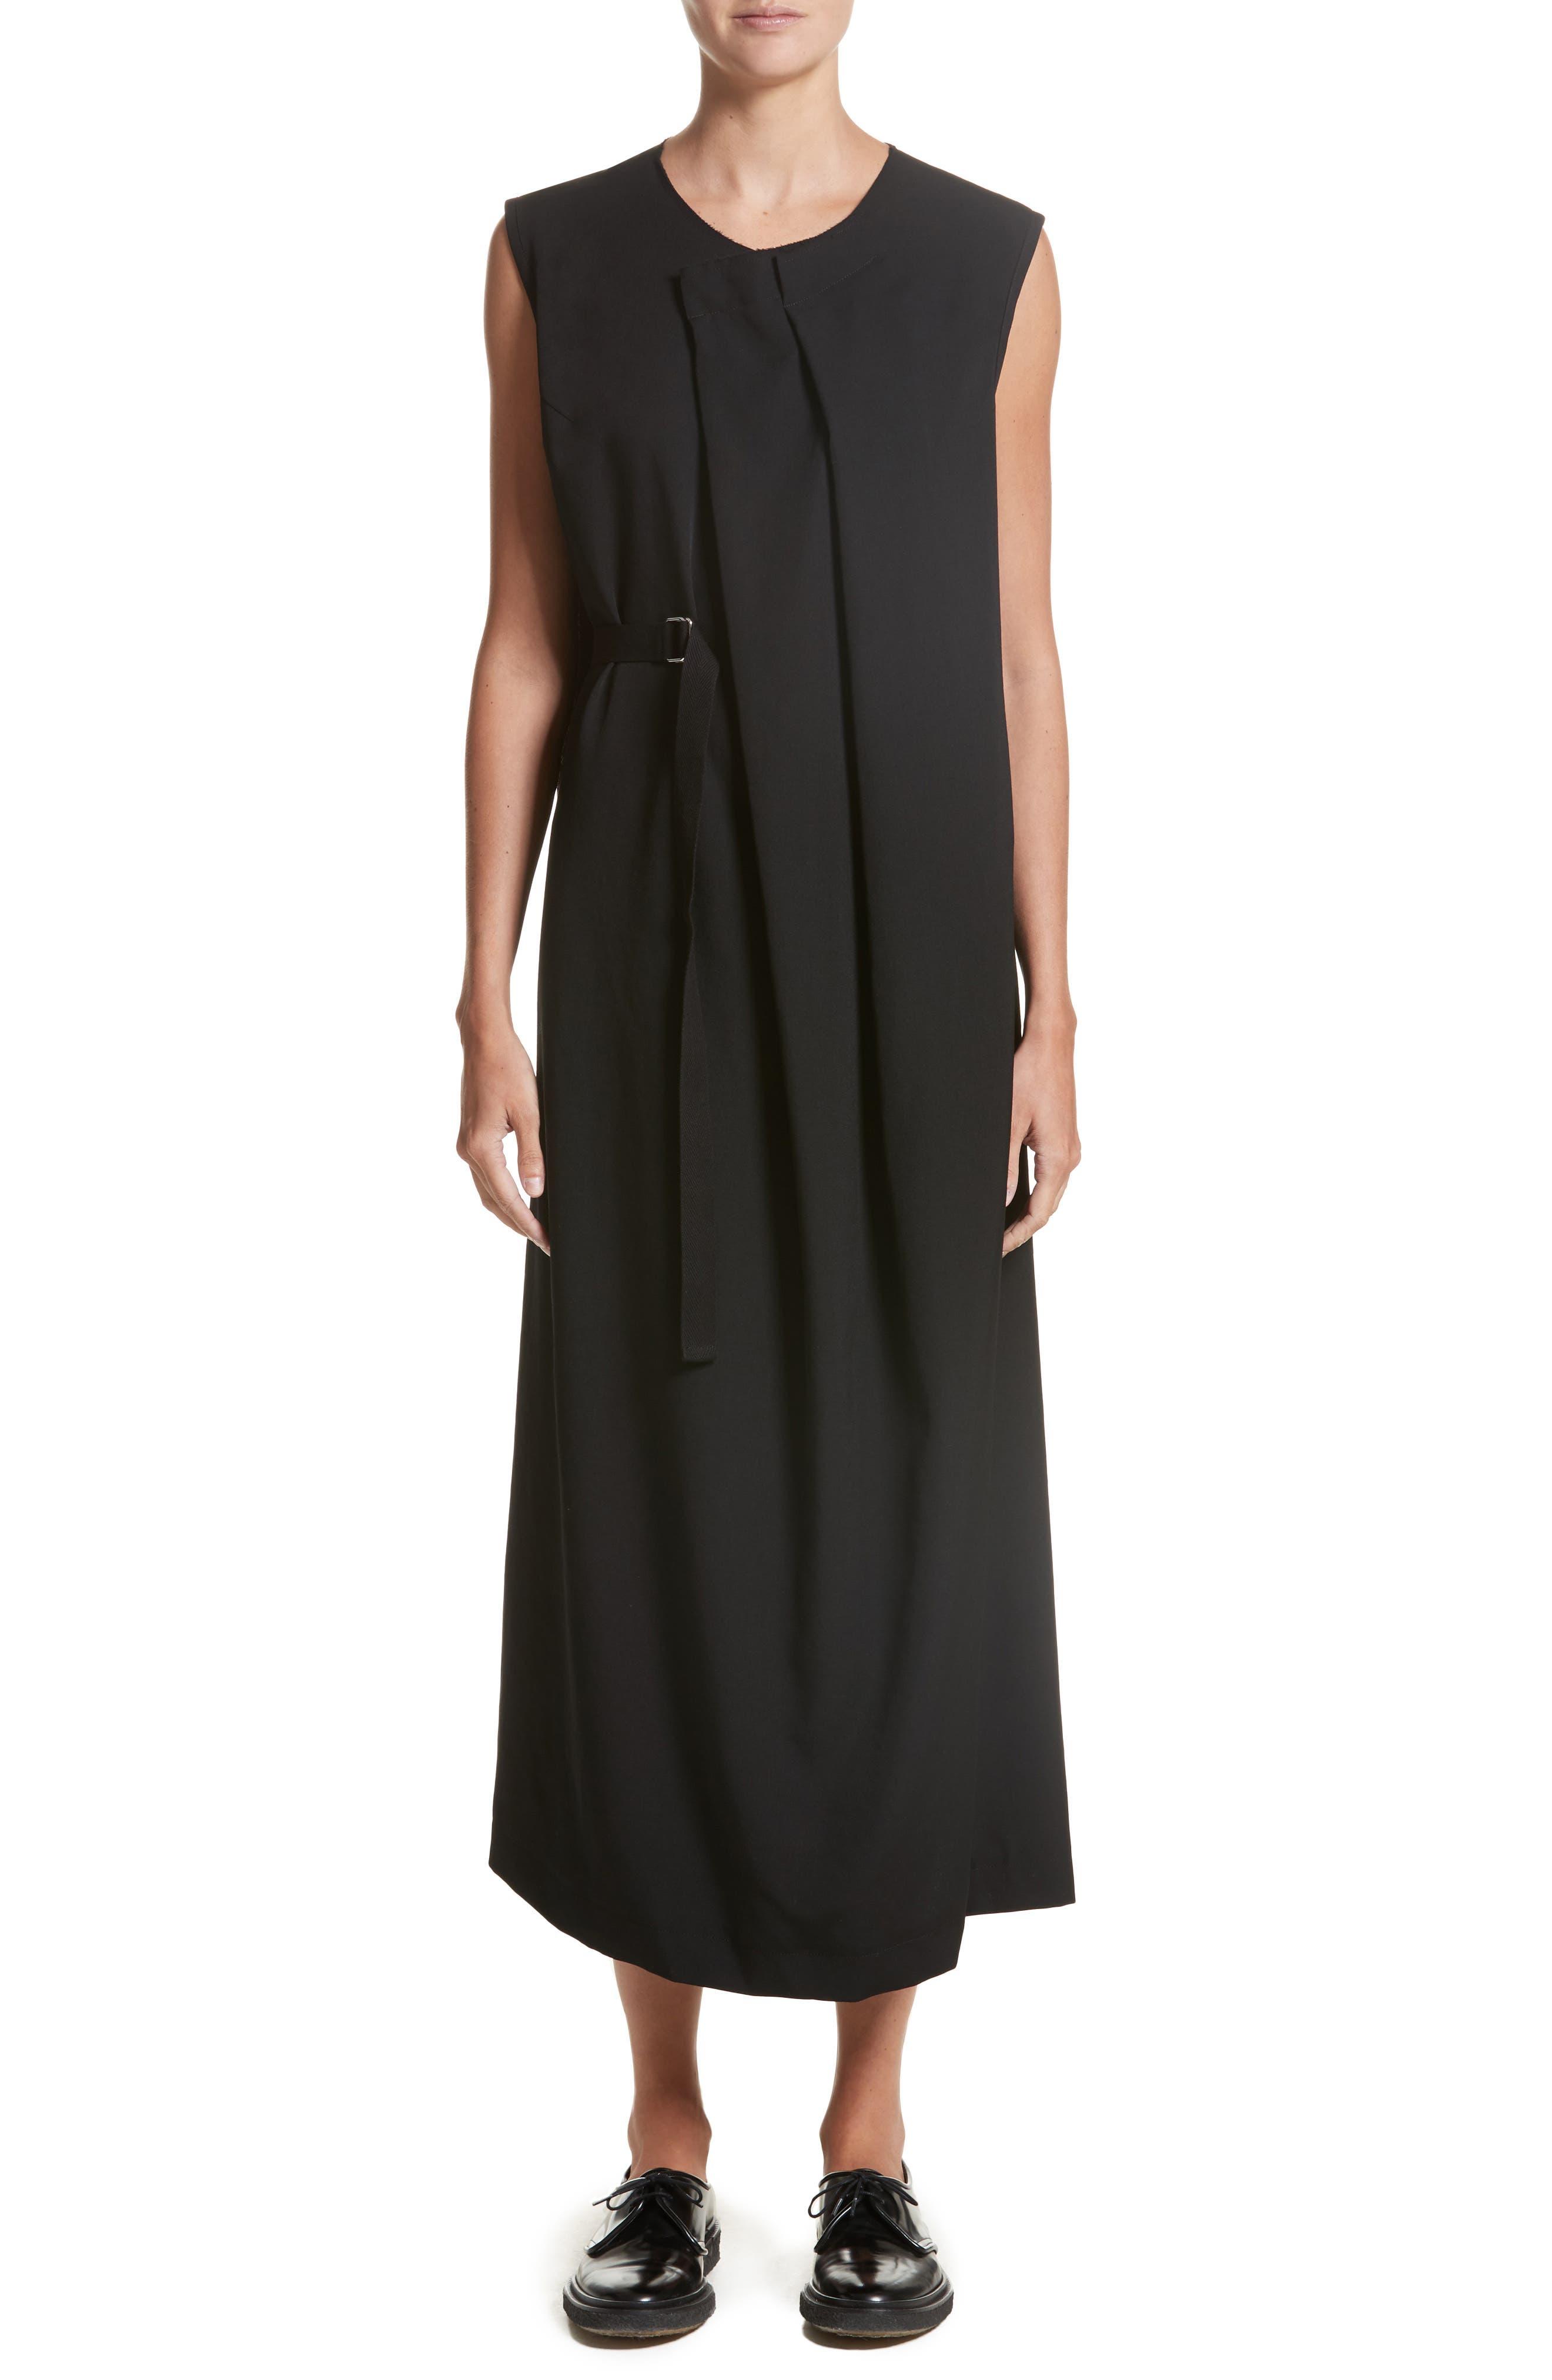 N-F Pleats Dress,                         Main,                         color, Black